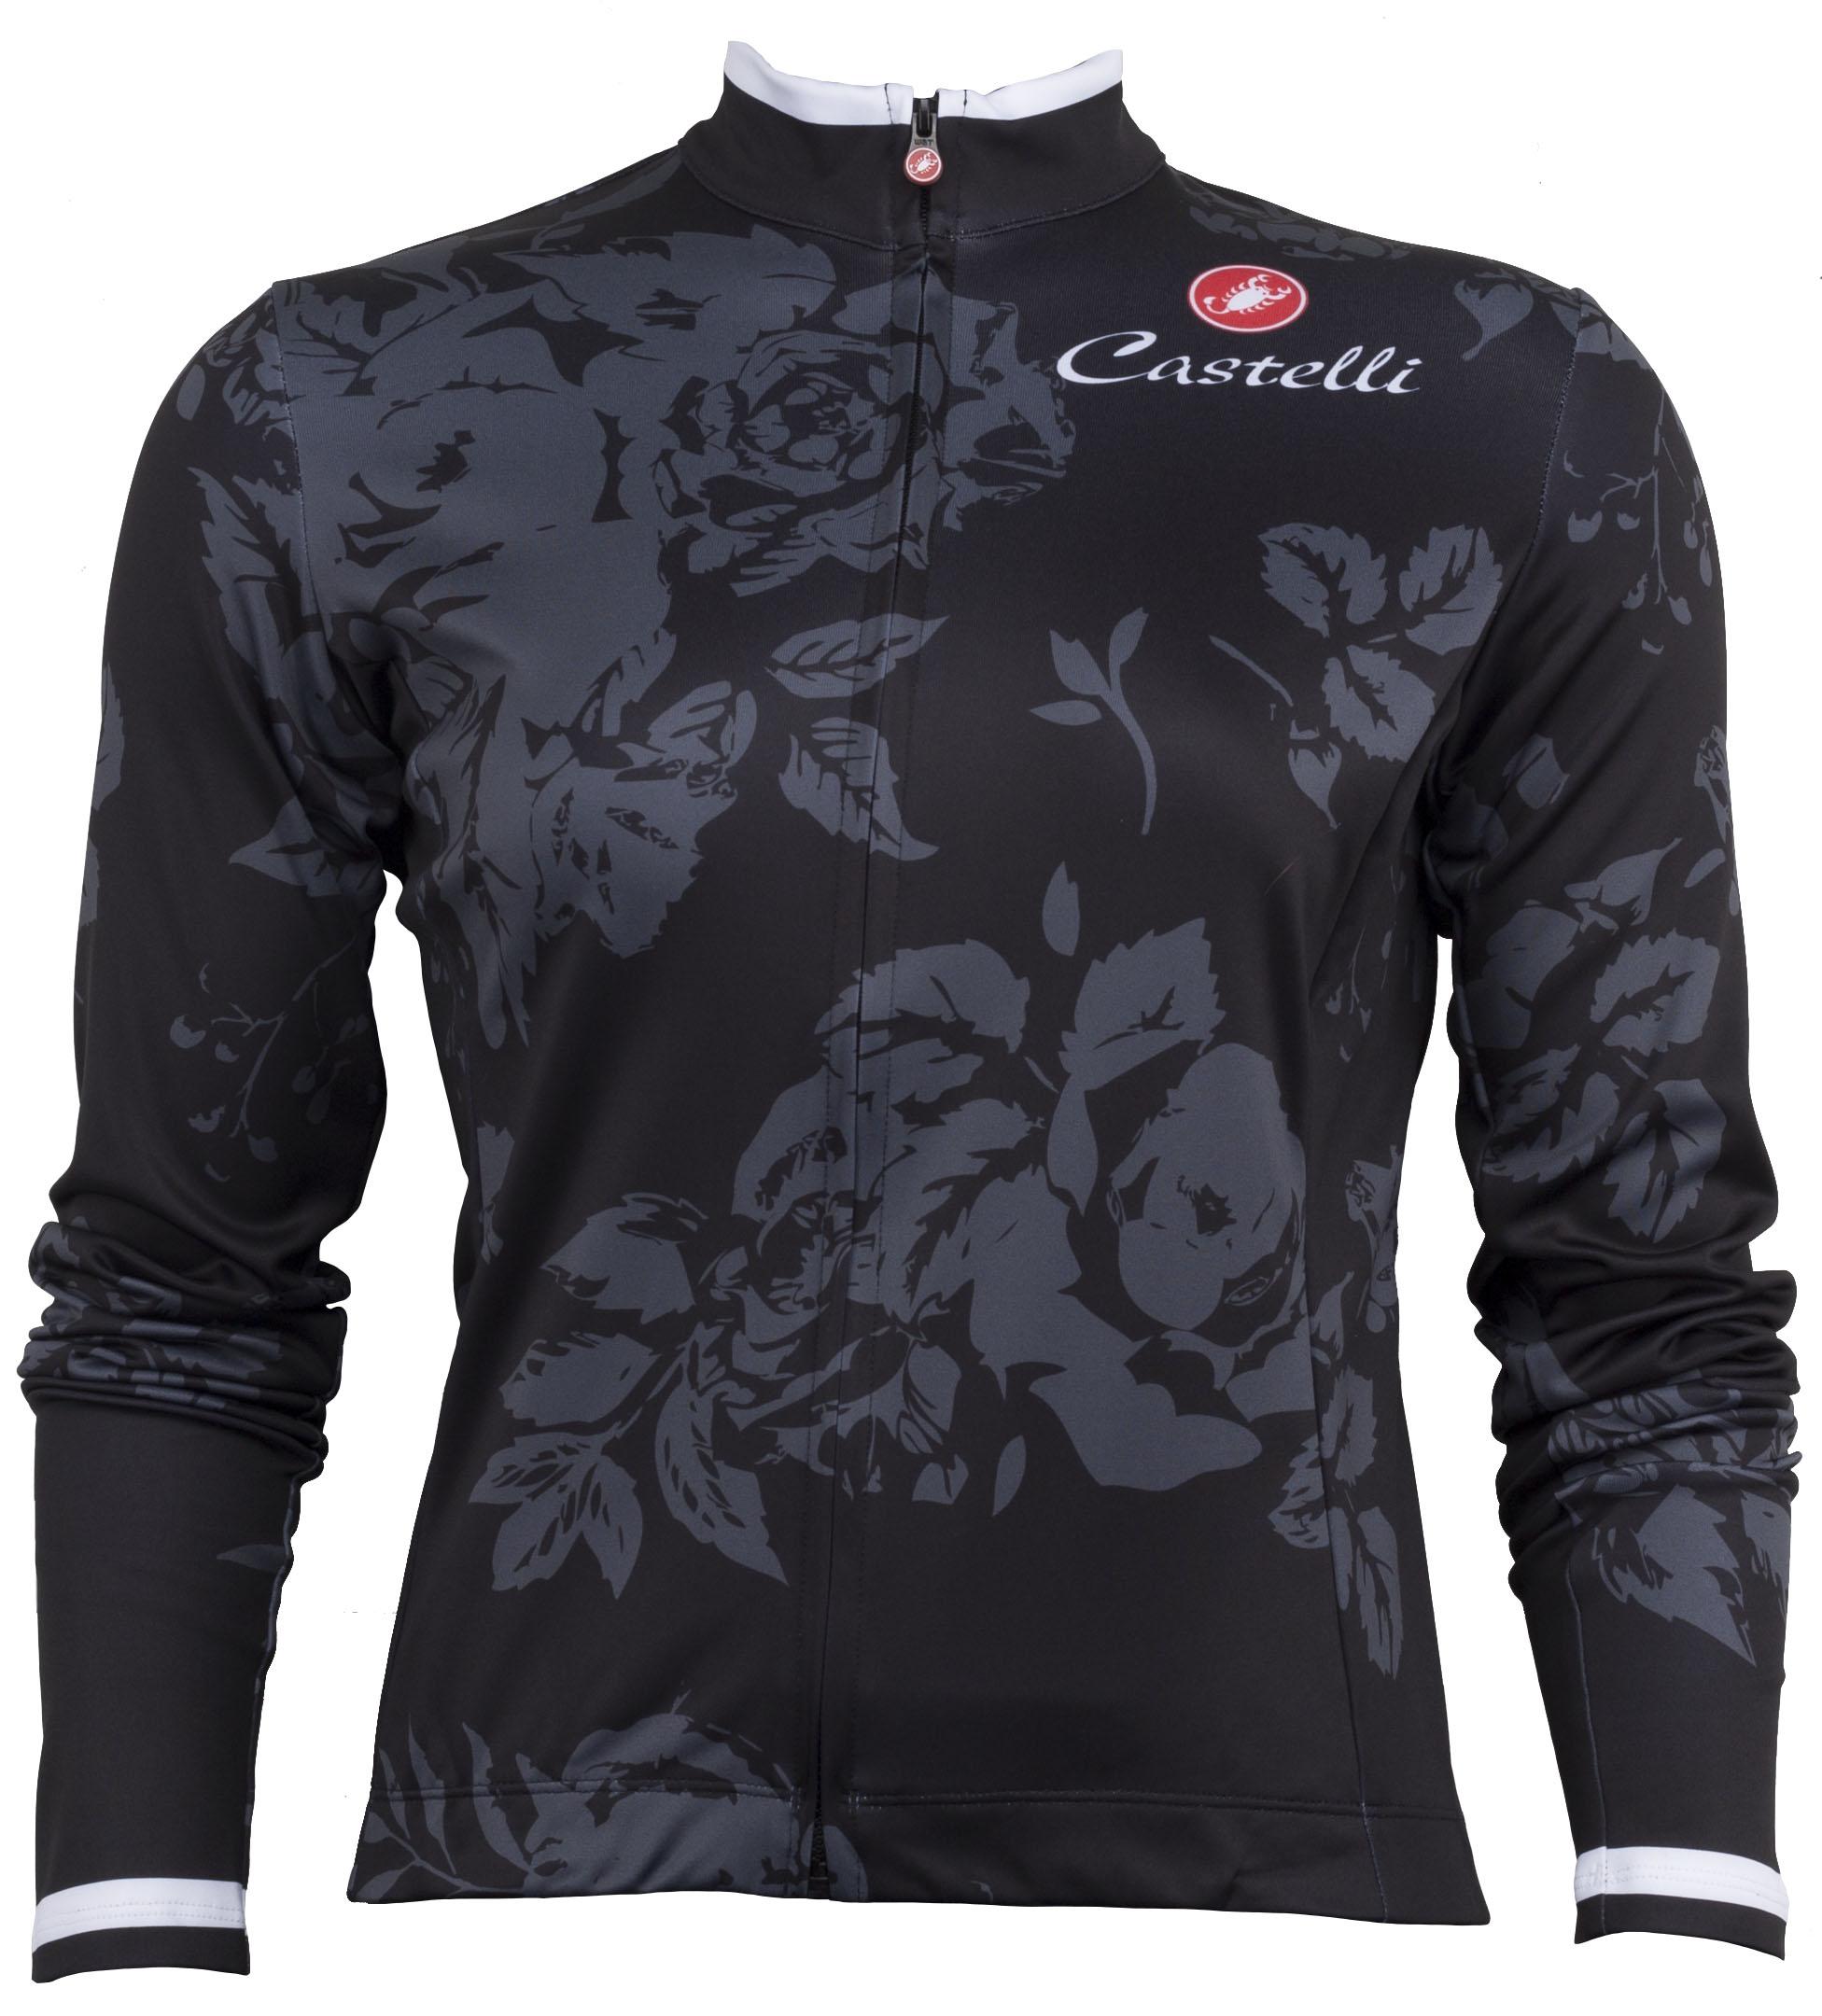 Castelli Women's Scambio Jersey